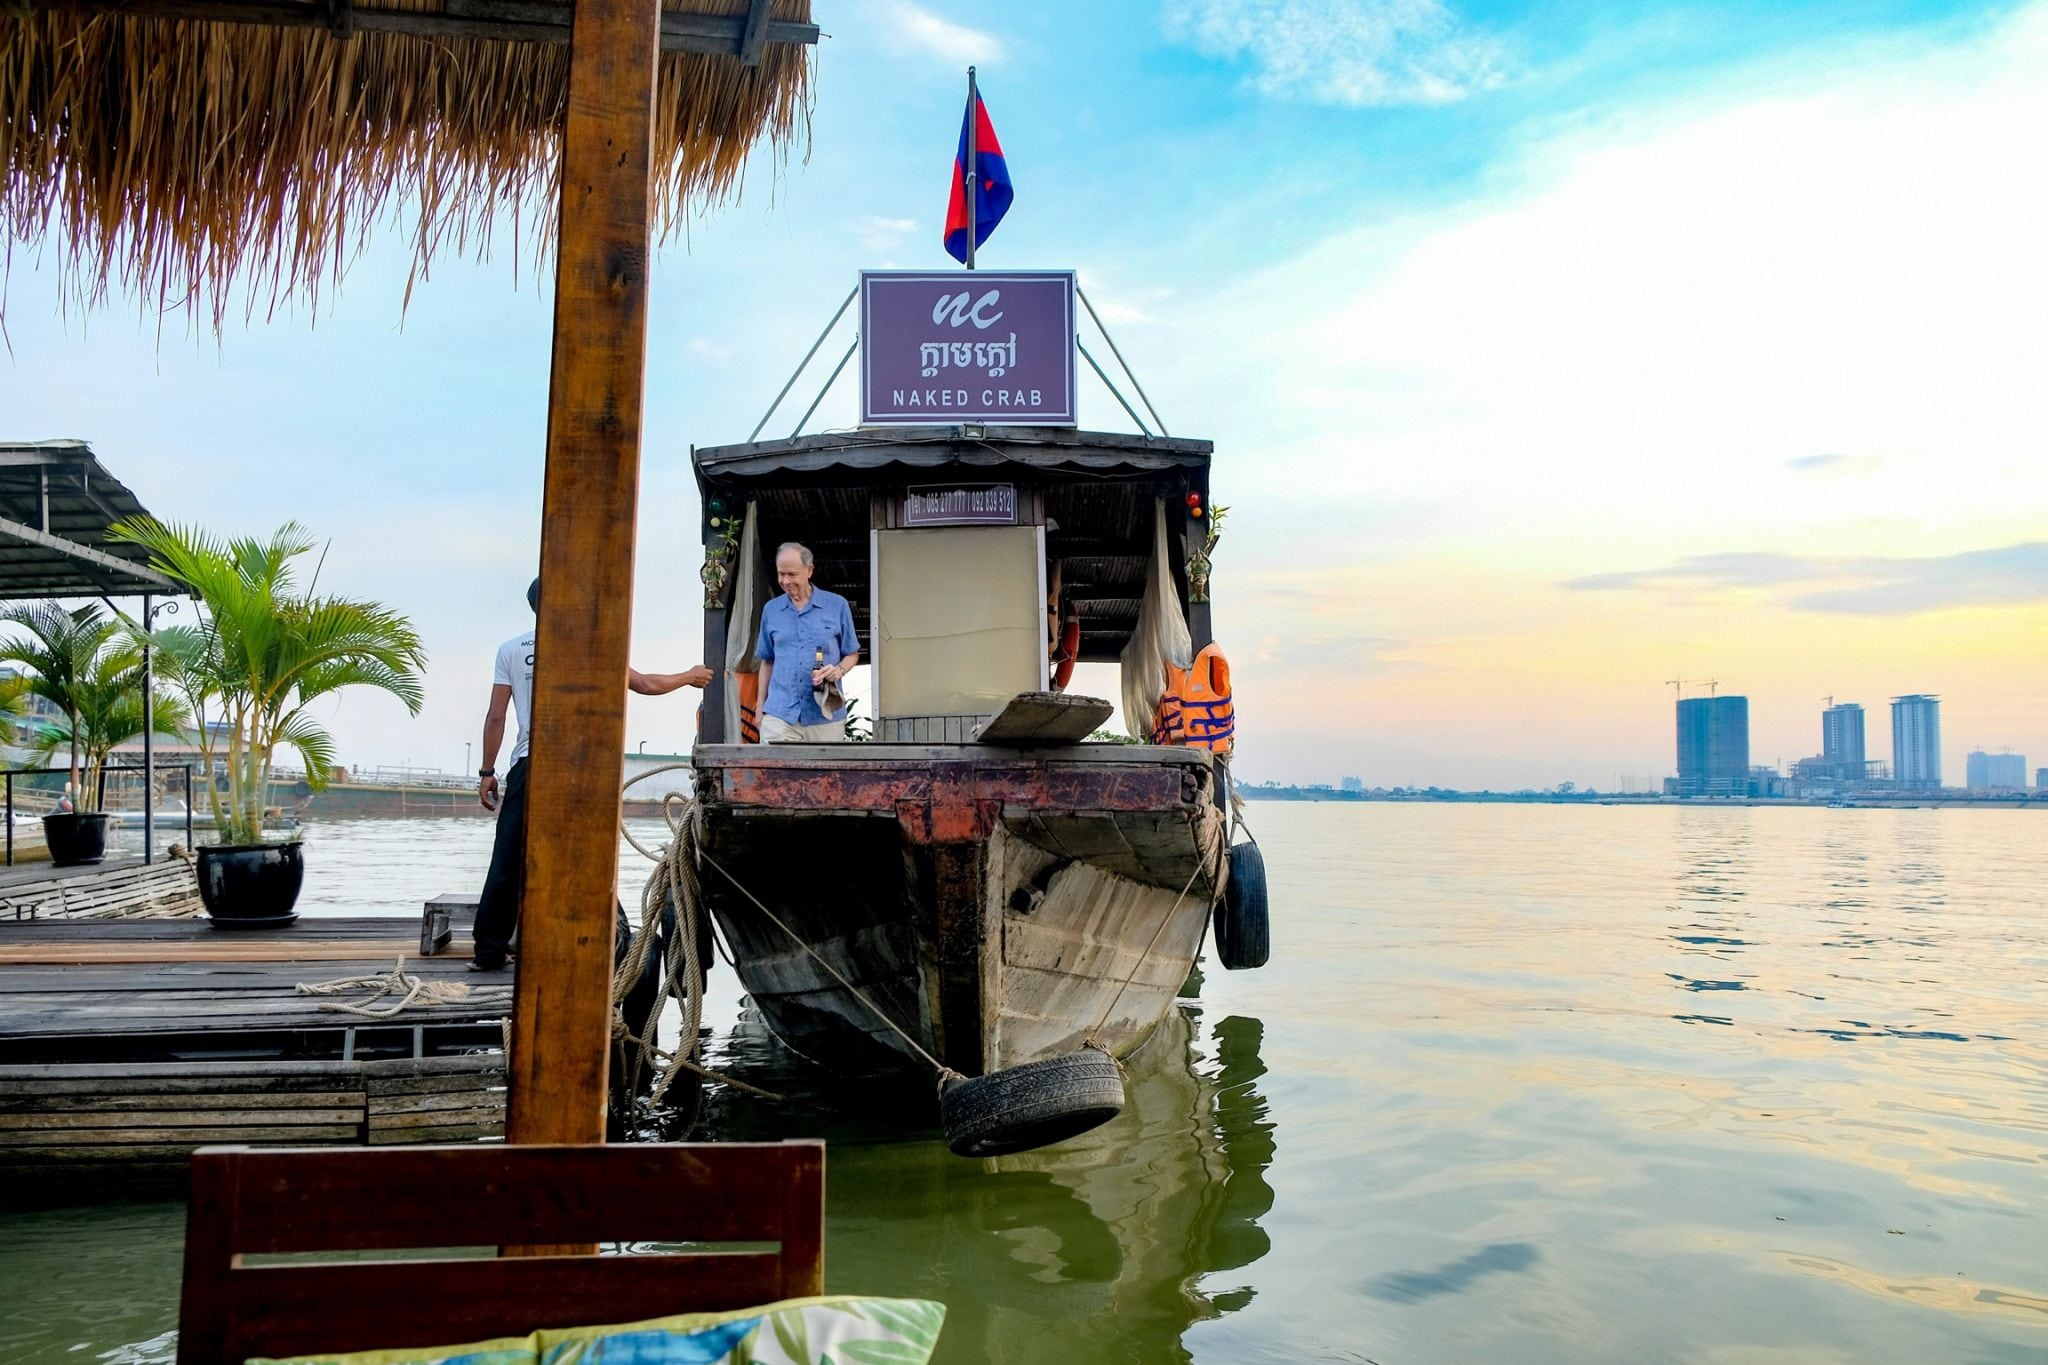 Mekong FloatationRiver Lounge